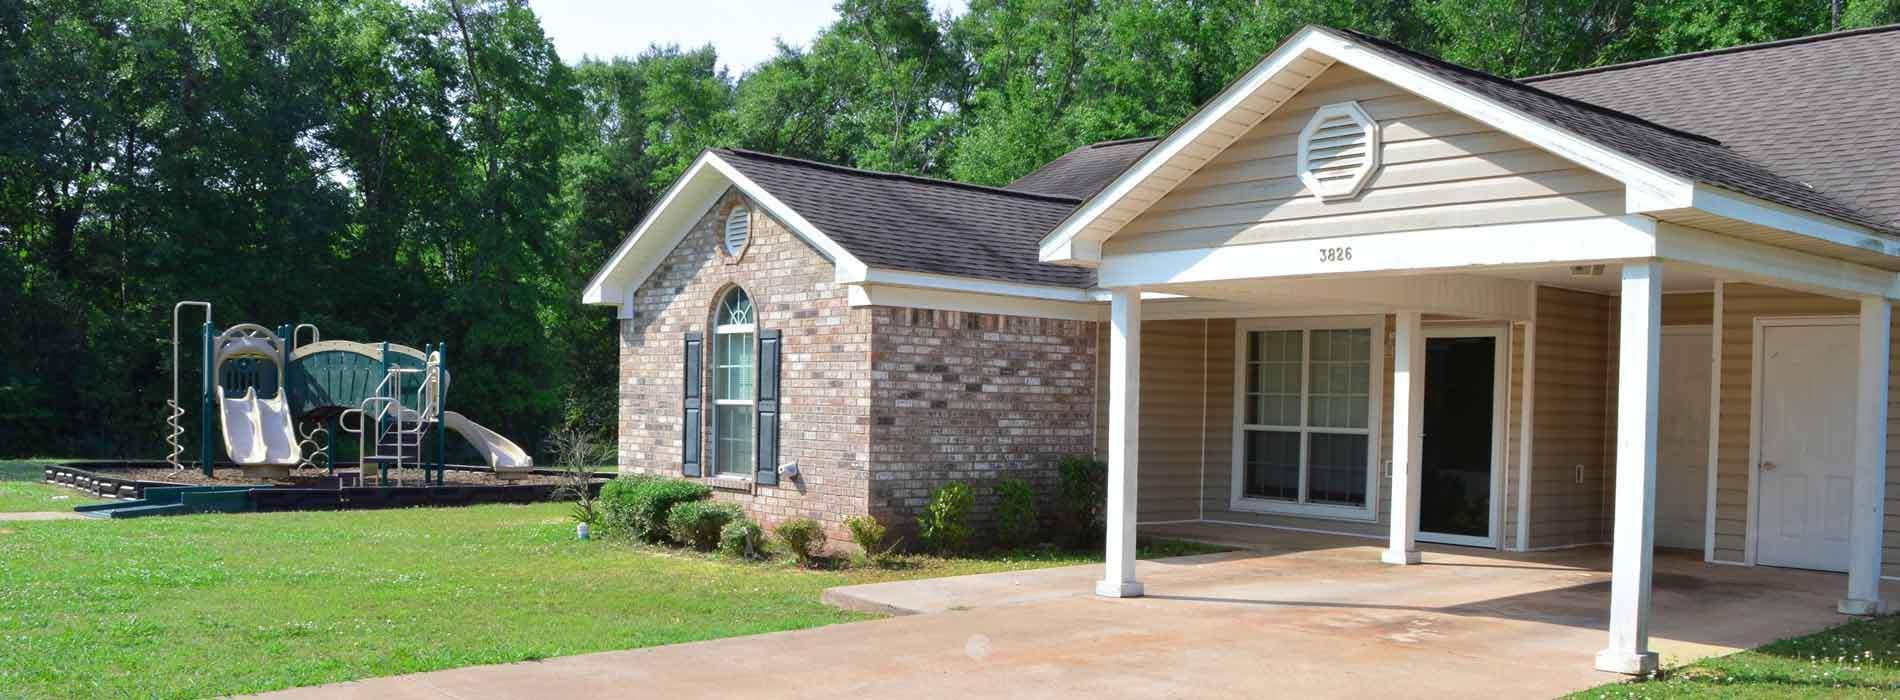 Pleasing Silver Leaf Estates Alexandria La 318 445 3530 Home Interior And Landscaping Oversignezvosmurscom